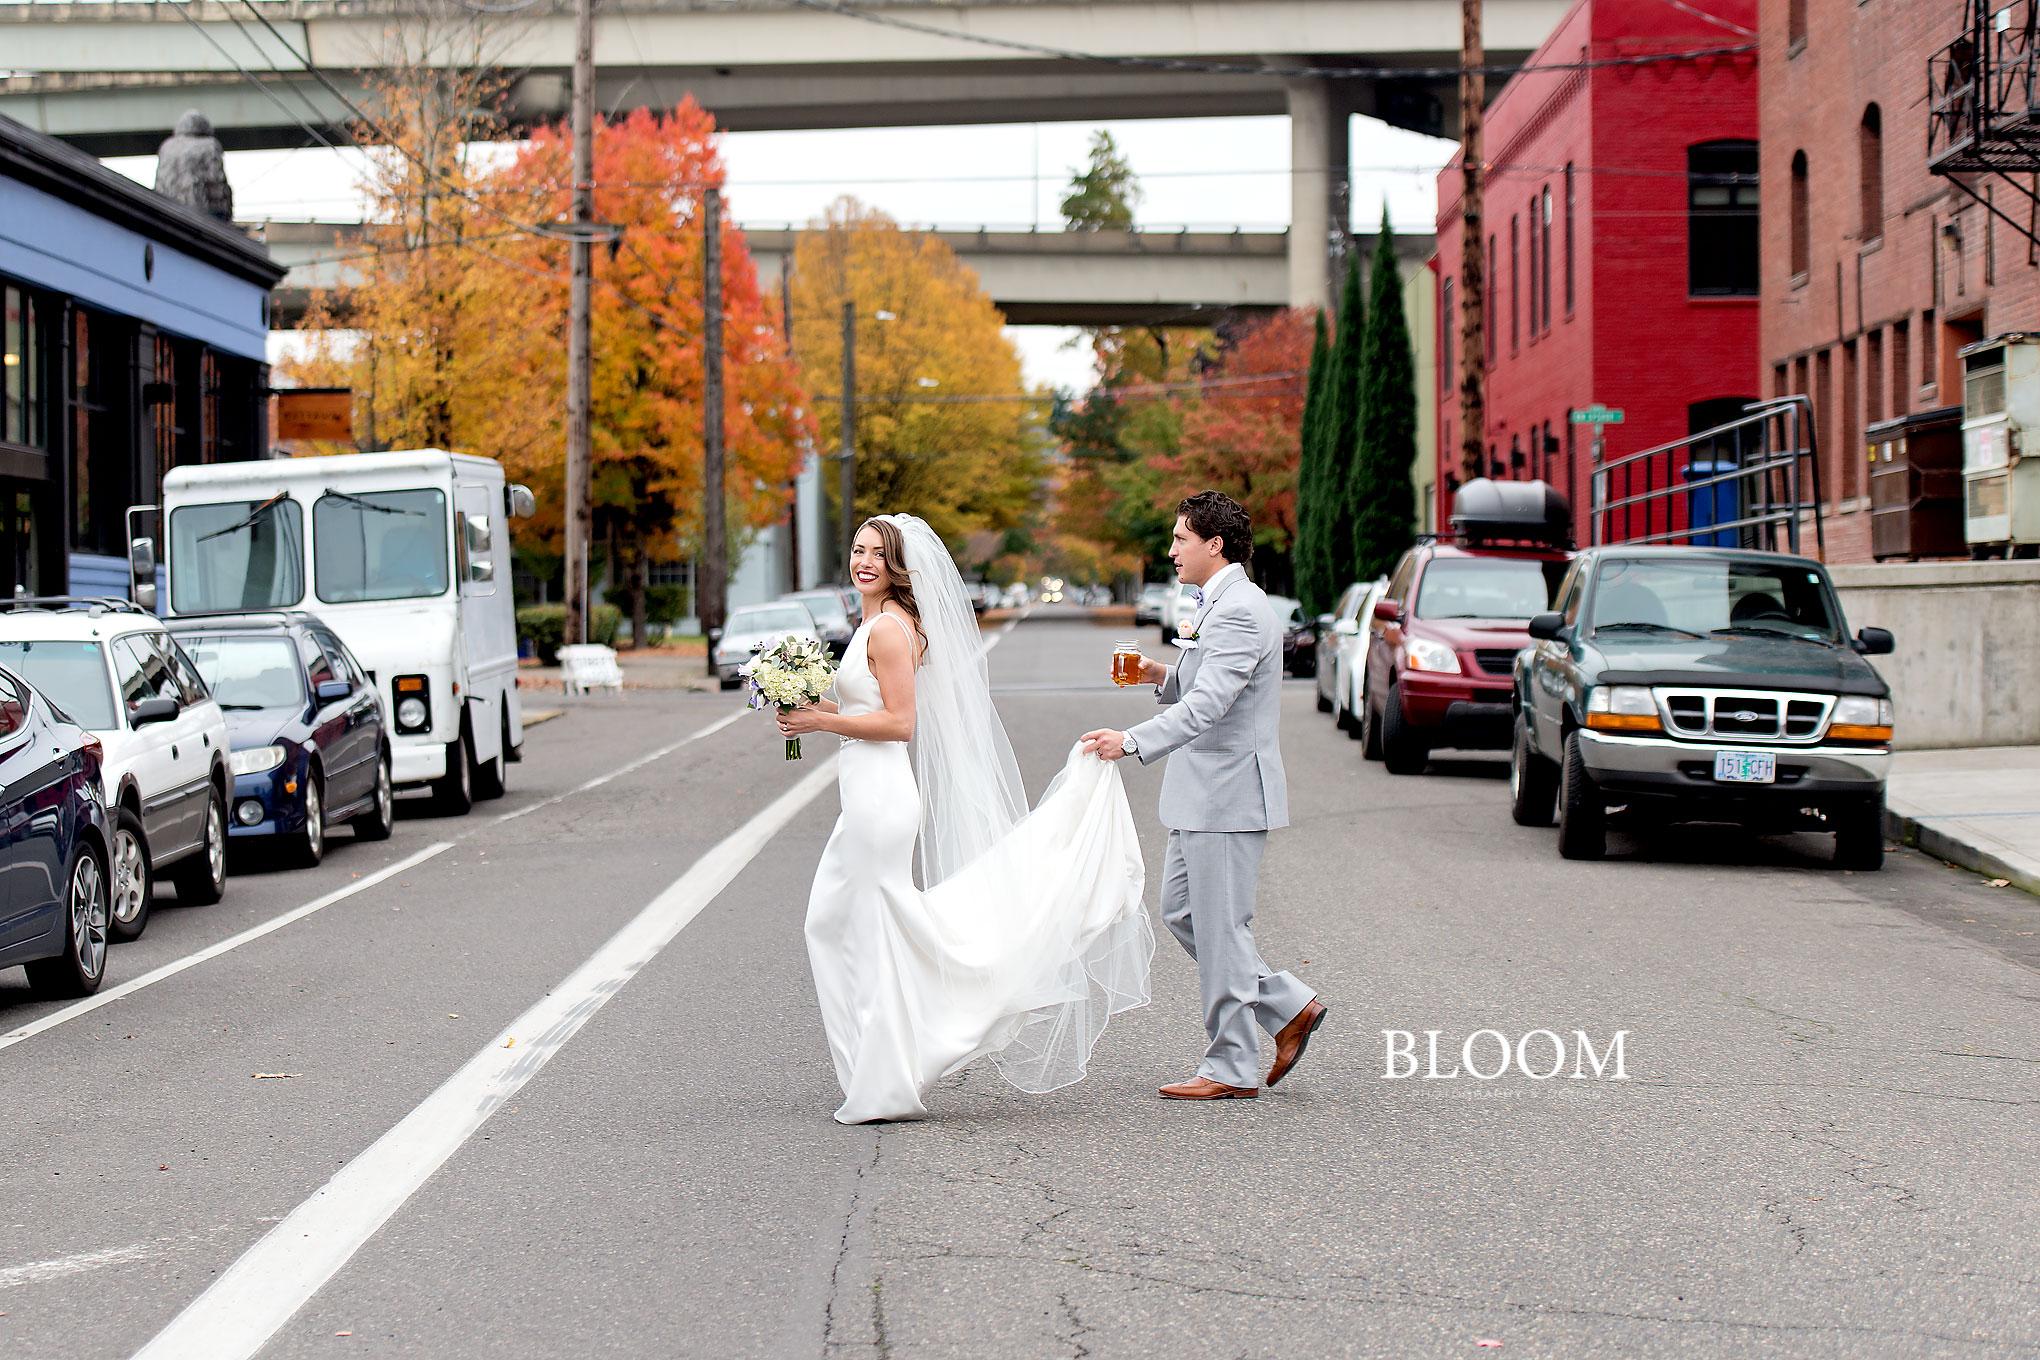 portlan_oregon_wedding_san_antonio_photographer_bloom_102316_NMM_7151.jpg